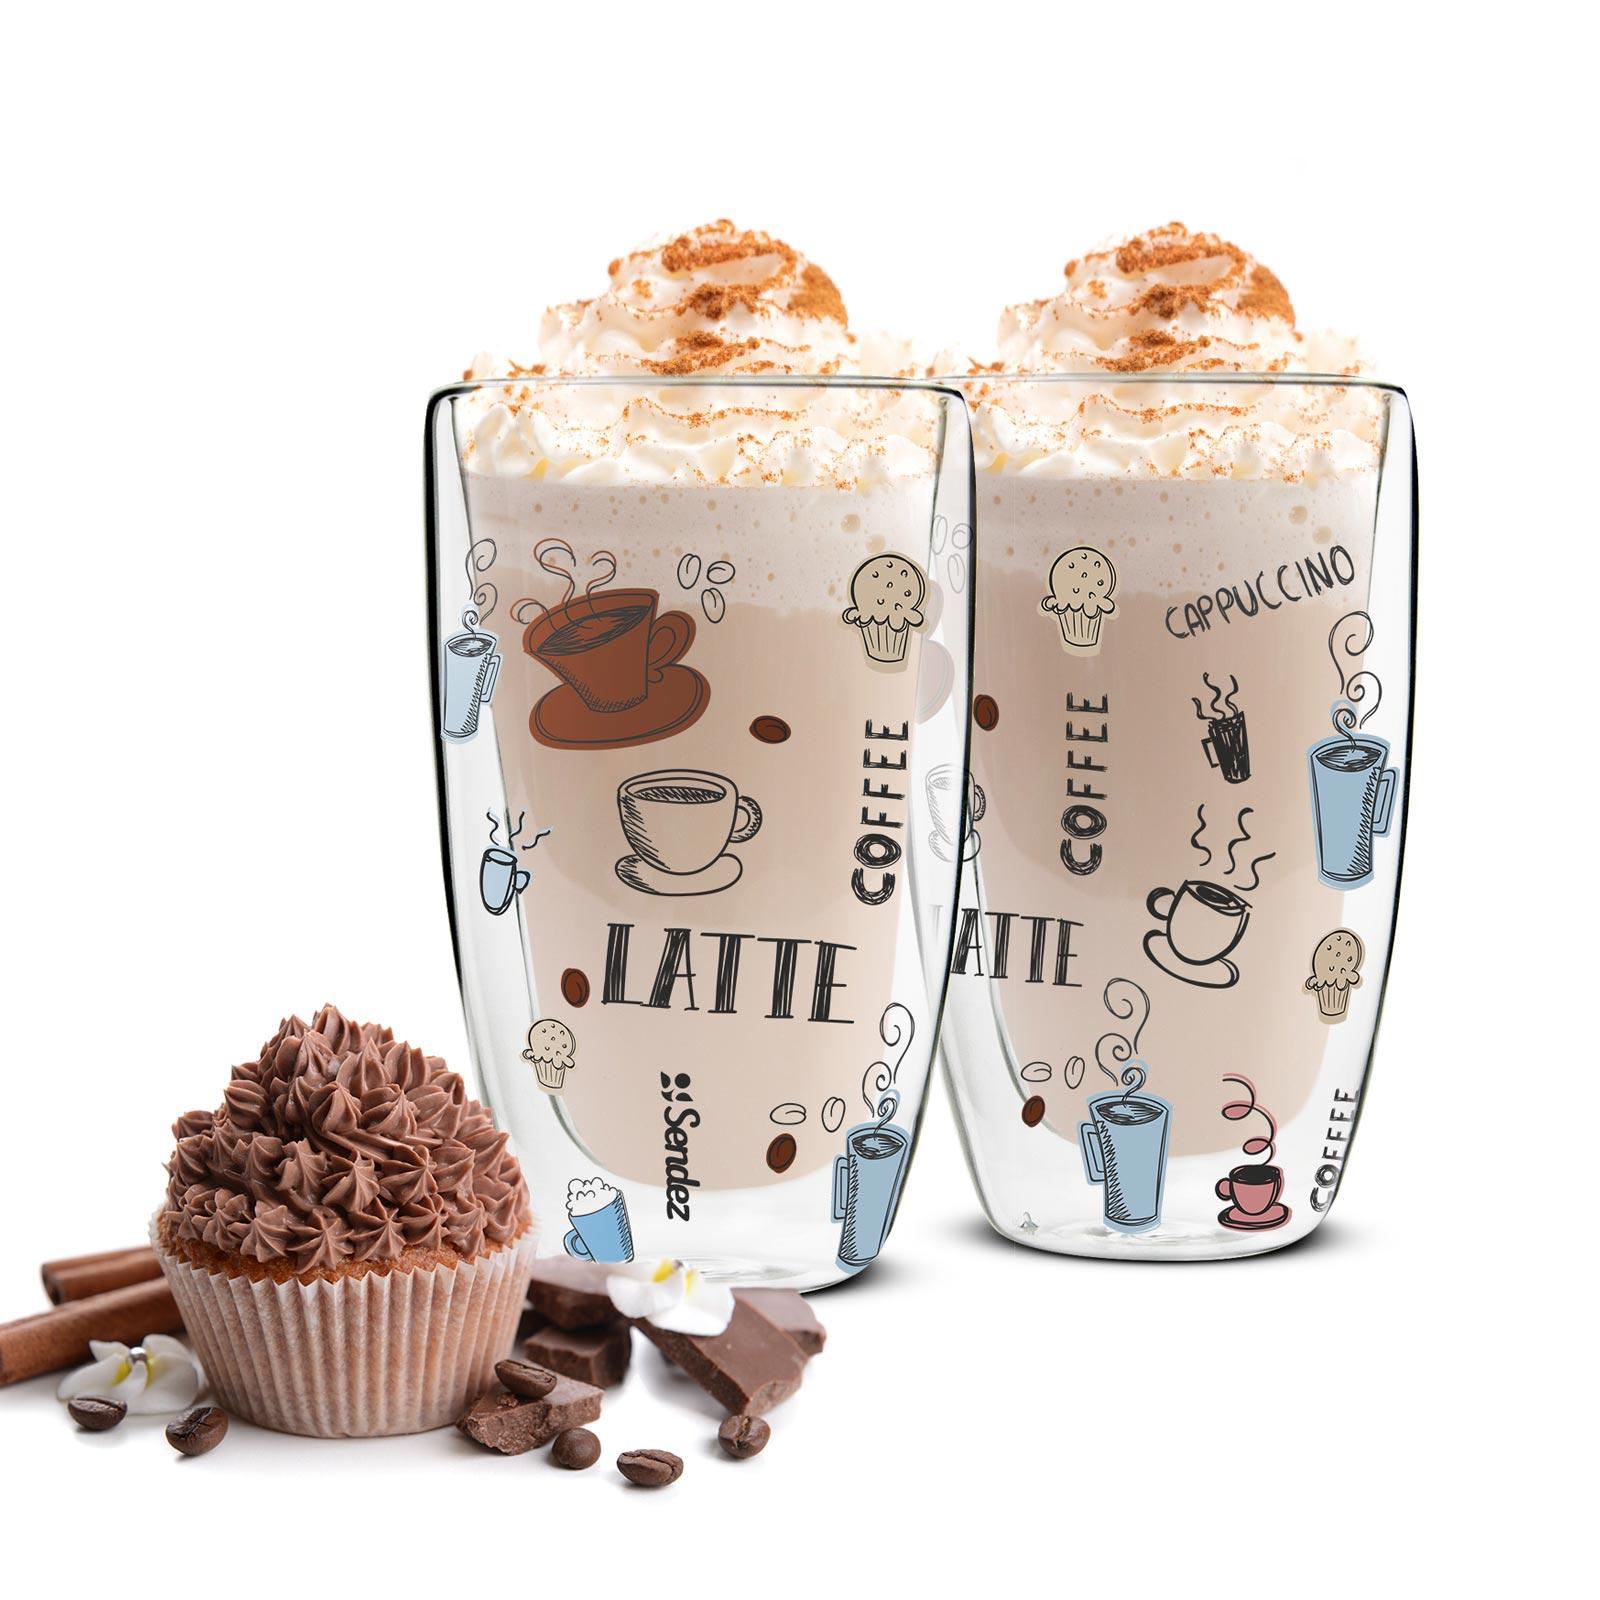 2 doppelwandige latte macchiato gl ser 450ml 2 l ffel kaffegl ser buntes motiv ebay. Black Bedroom Furniture Sets. Home Design Ideas